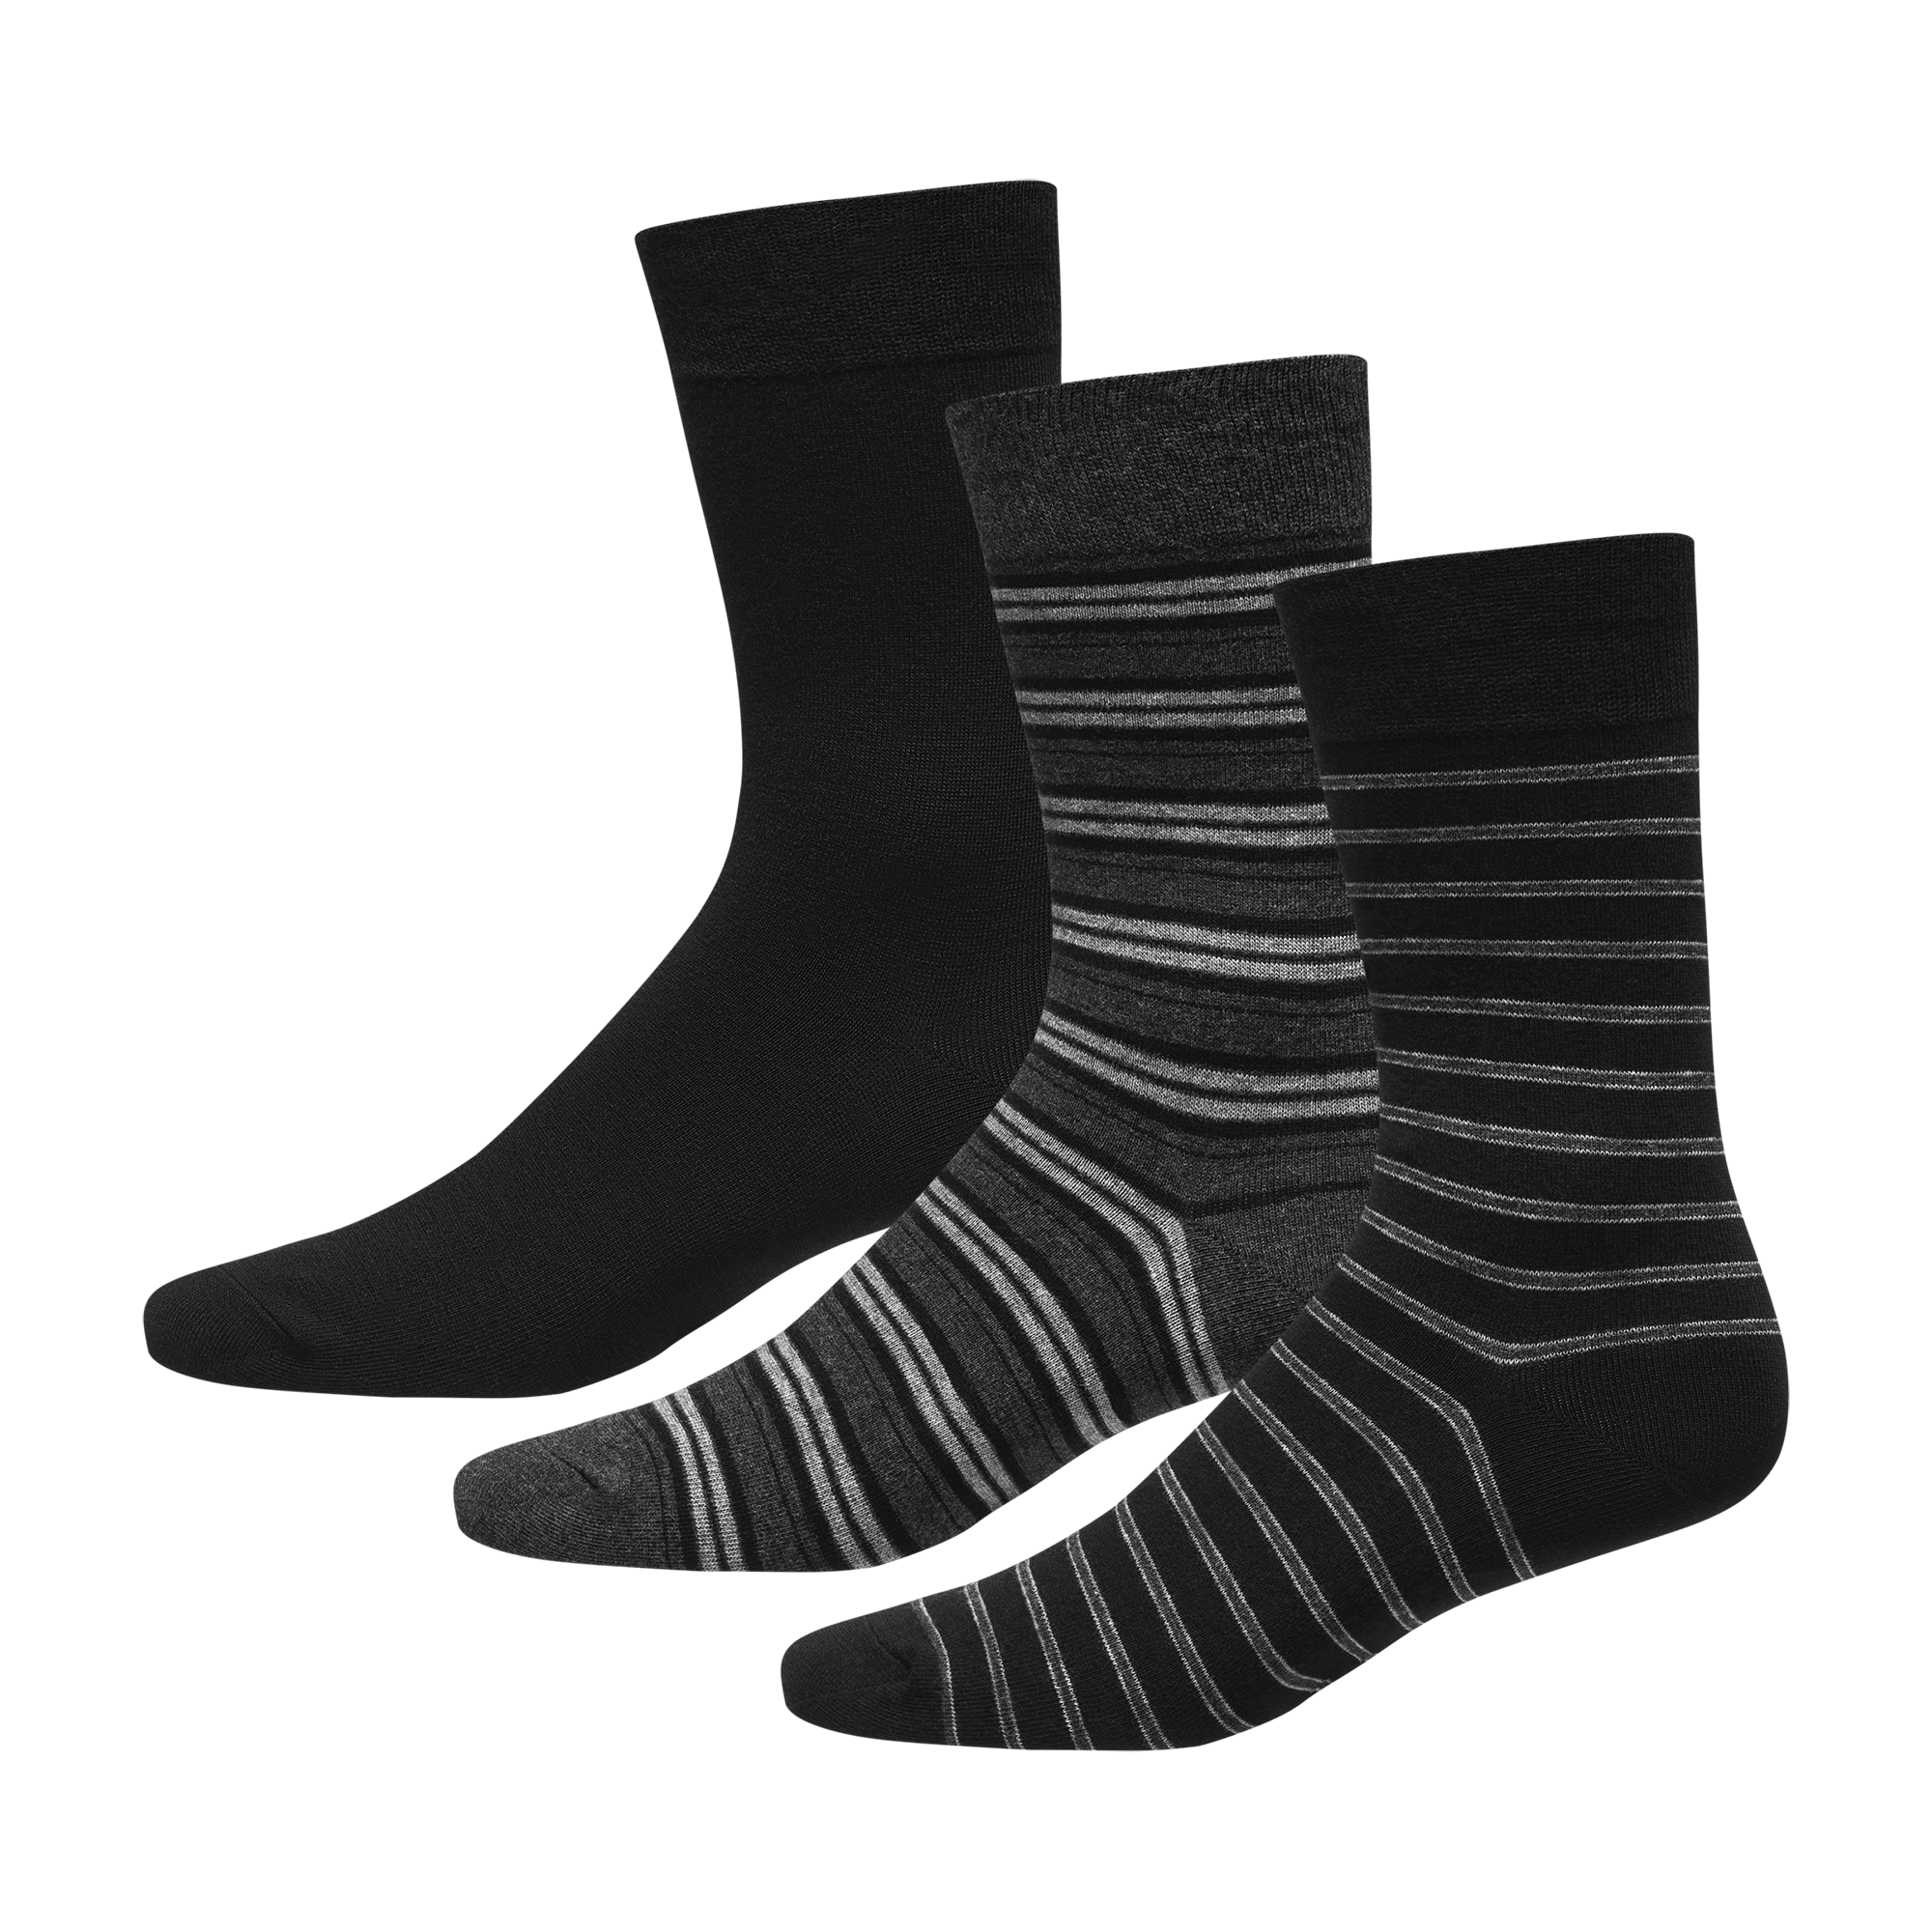 Socks product photography